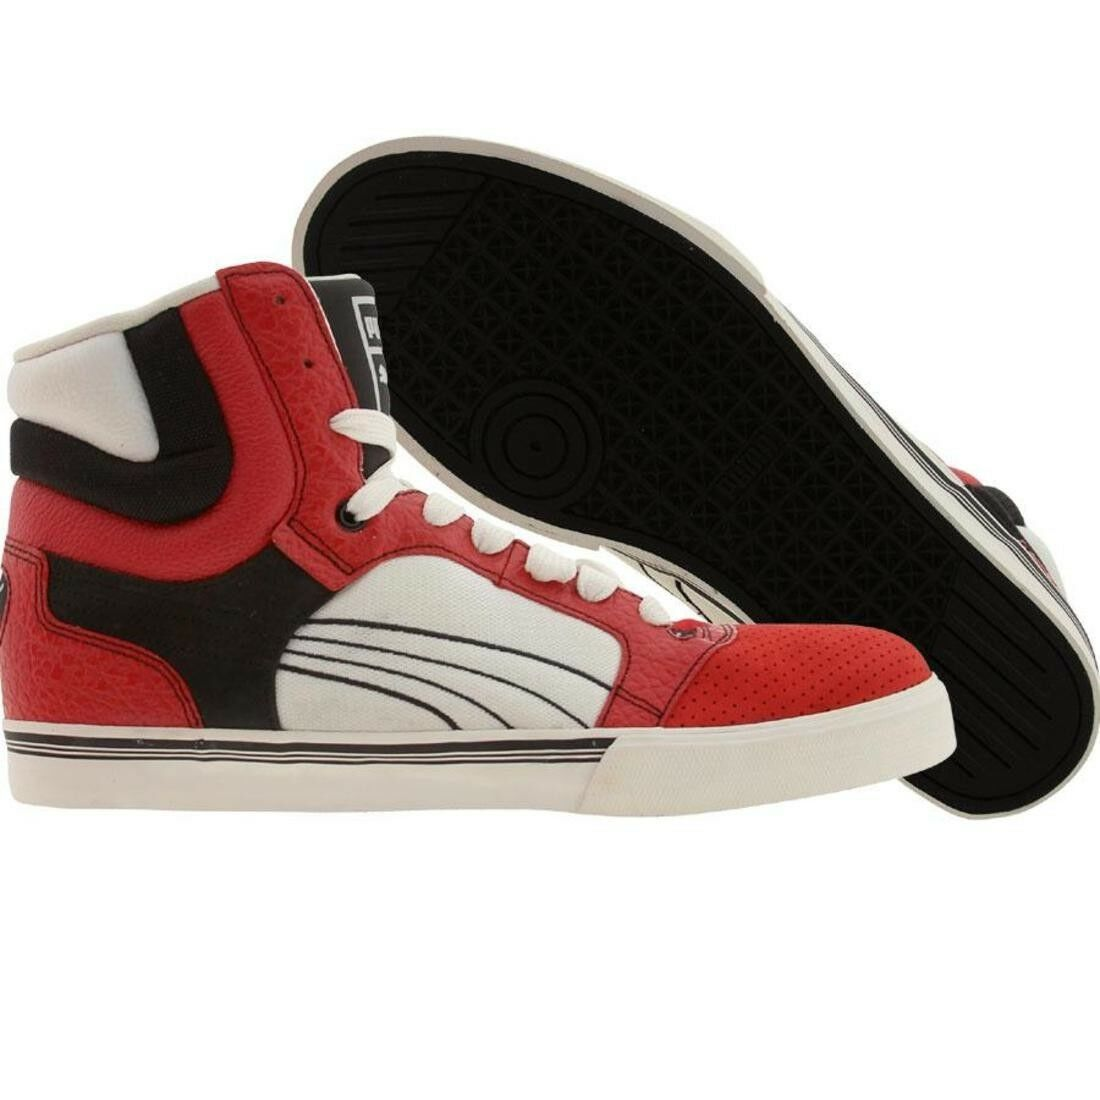 89.99 Puma Post Up High (ribbon red / black / white) 349271-07